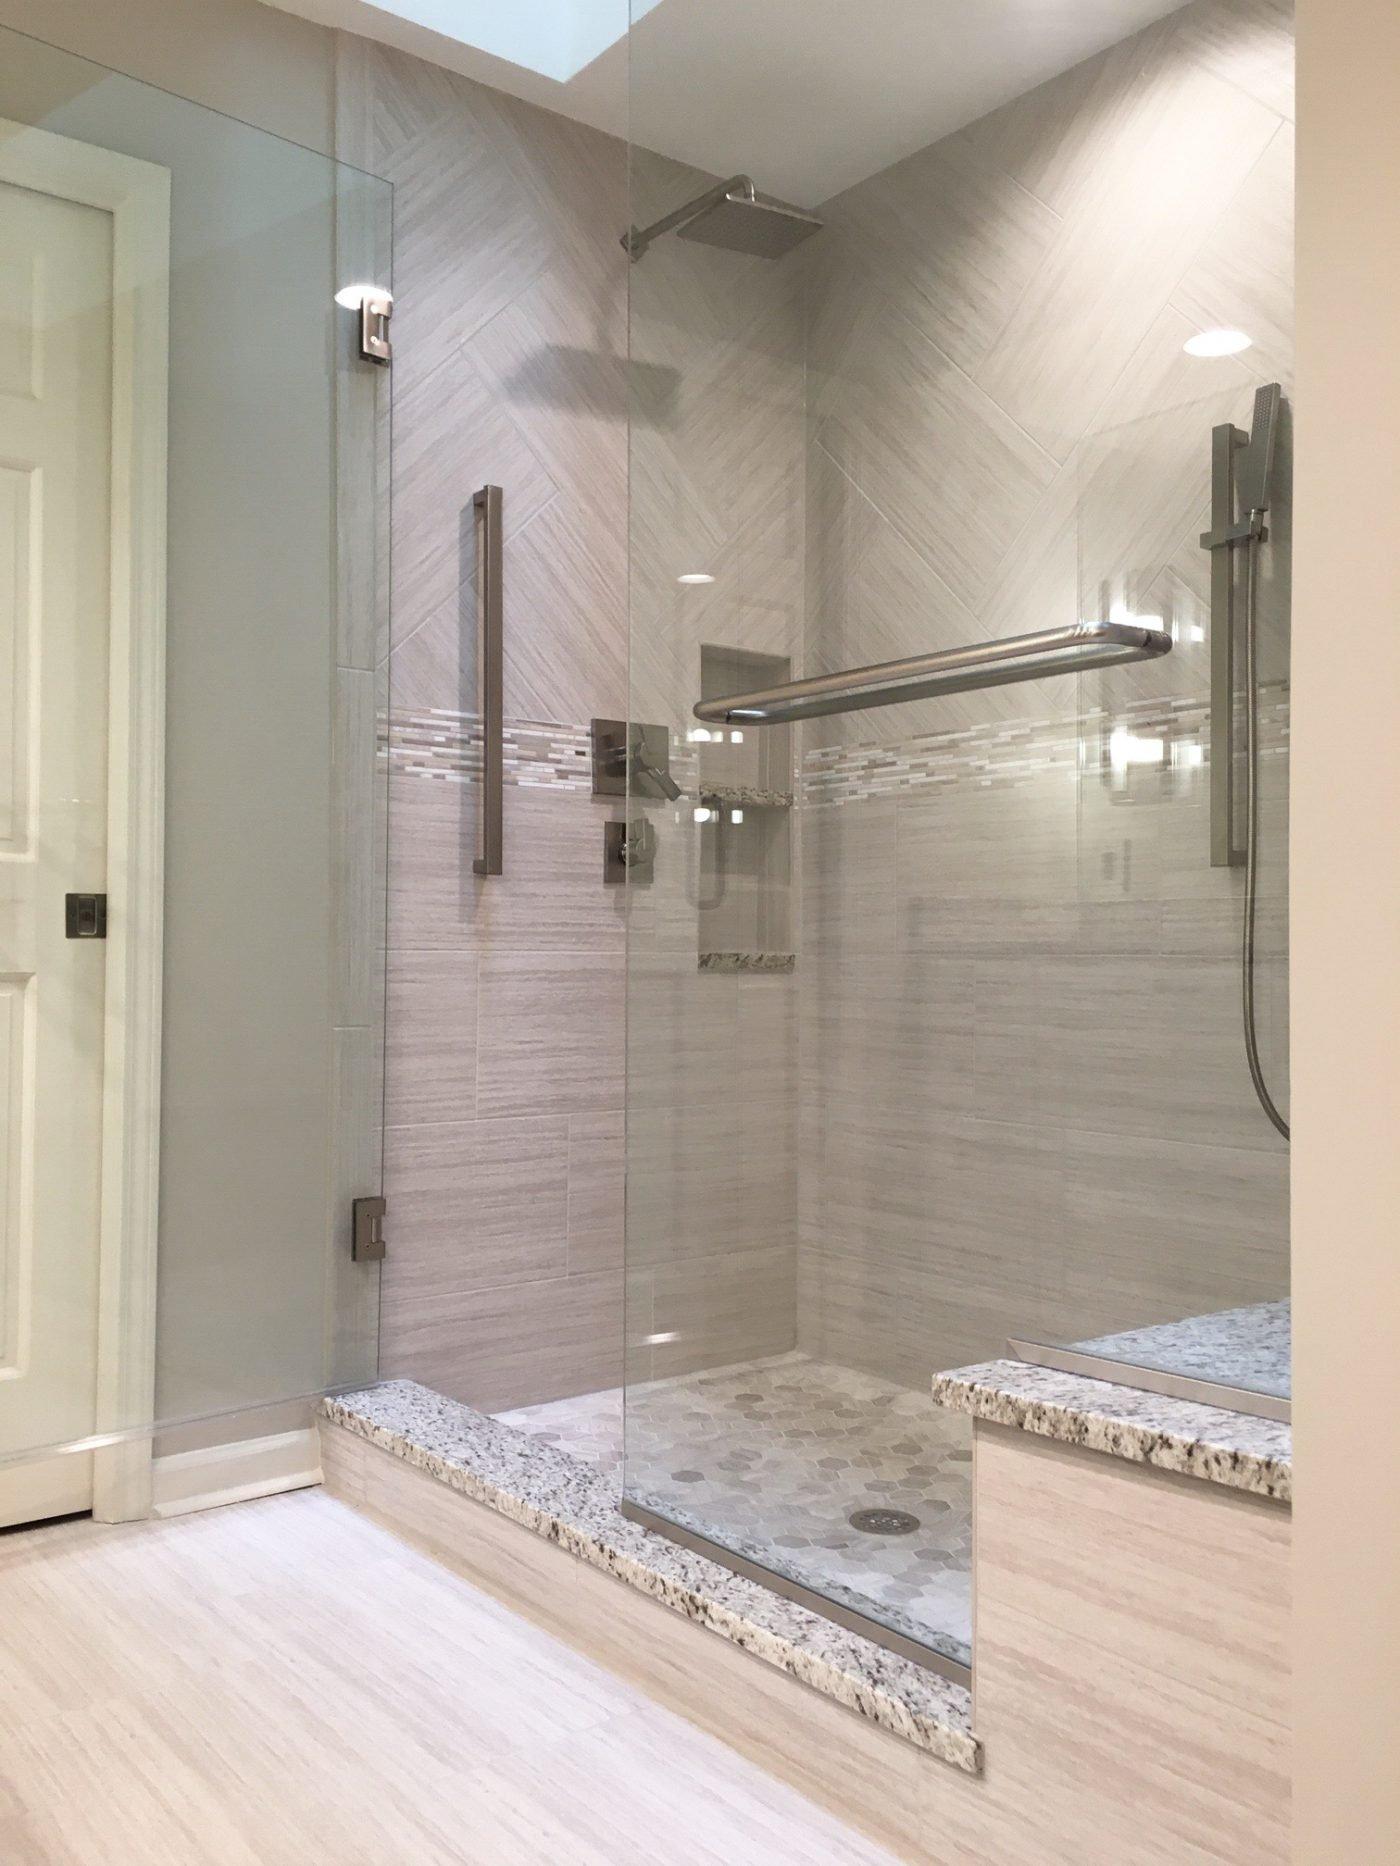 Radliff Bathroom Remodel